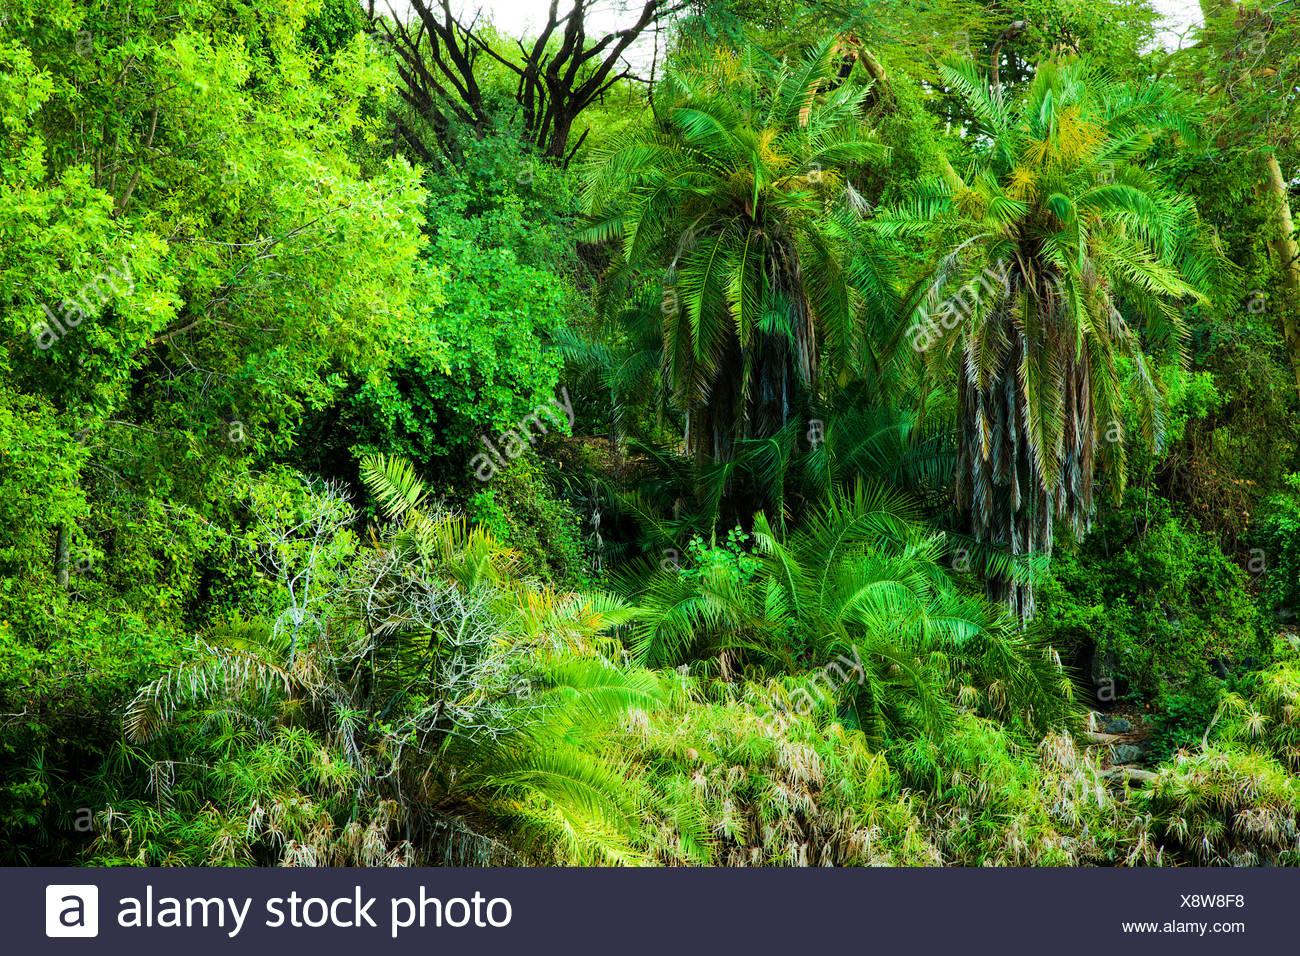 Download tropical rainforest landscape background. Jungle Bush Trees Background In Africa Tsavo West Kenya Stock Photo Alamy